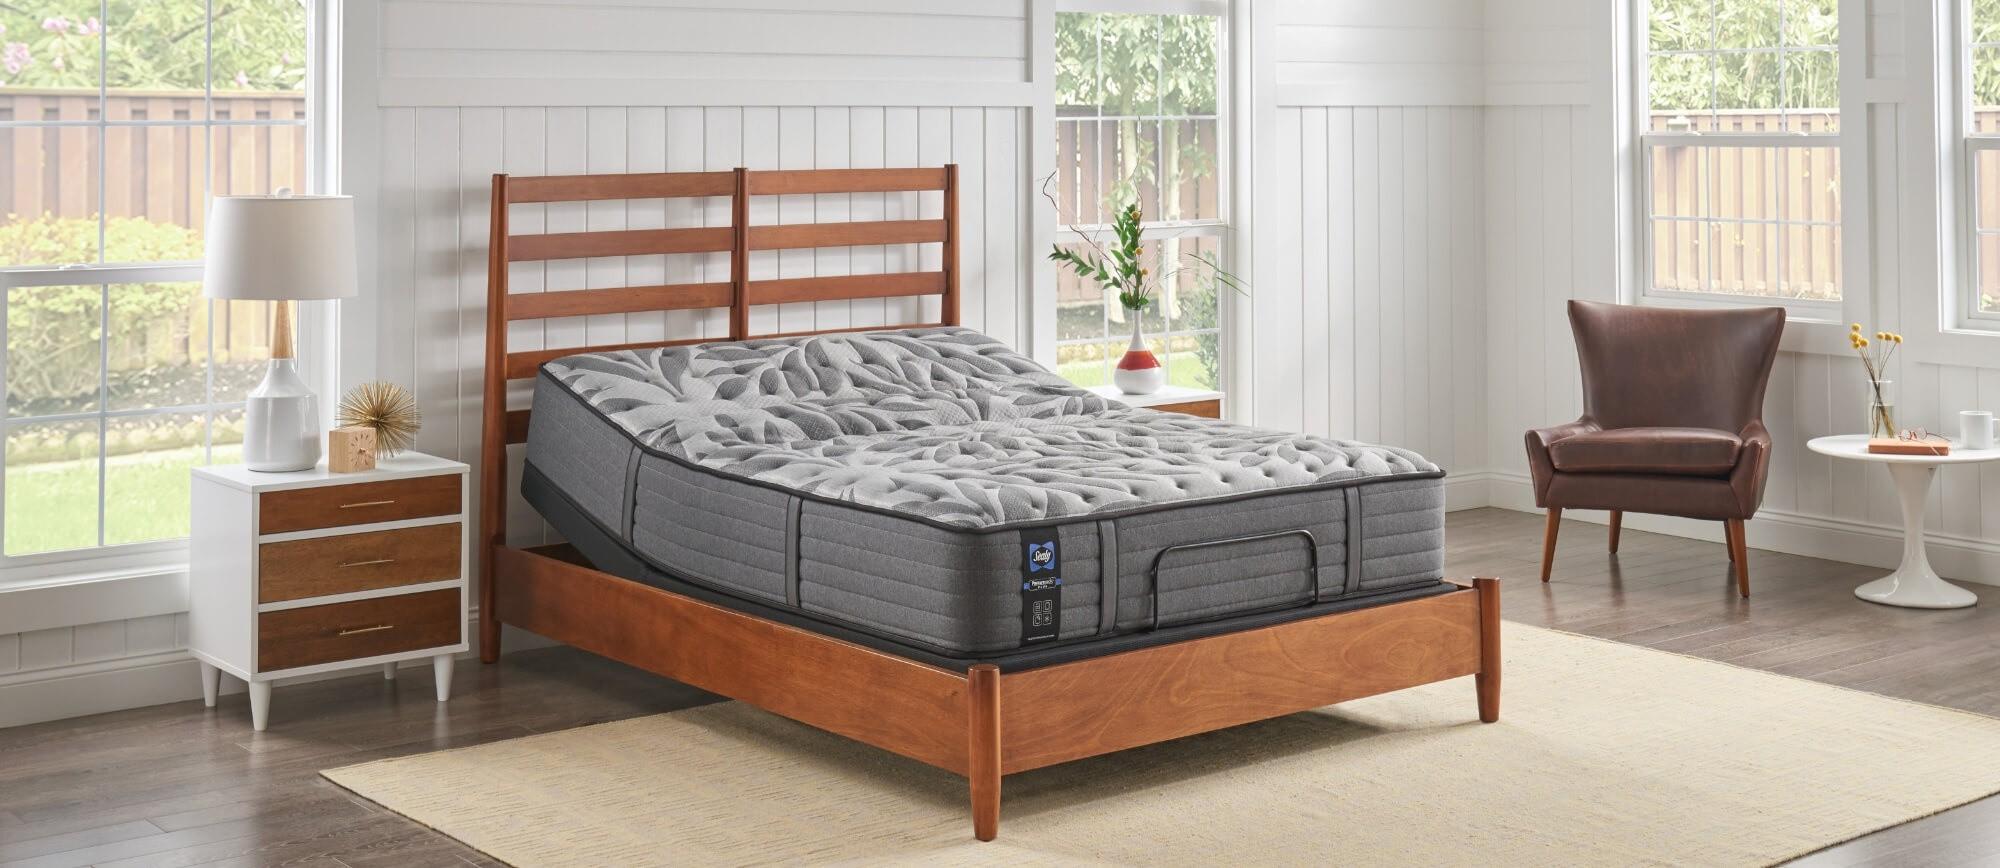 A Posturepedic Plus mattress